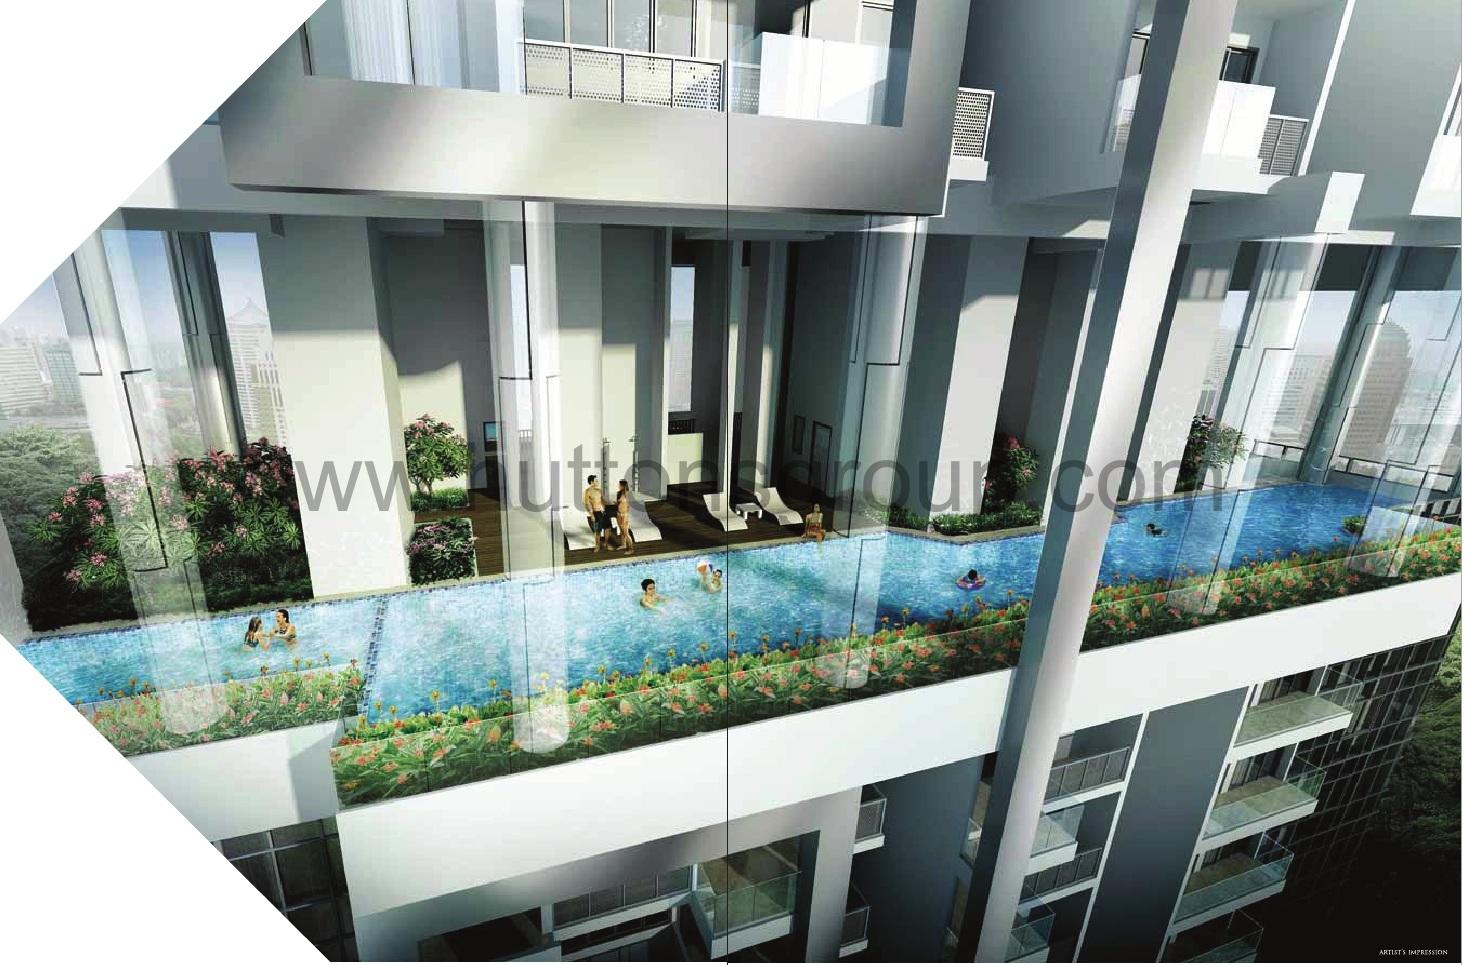 26-Newton Facilities 26 newton 26 Newton Singapore| Showflat Hotline +65 61007122 26 newton facilities1